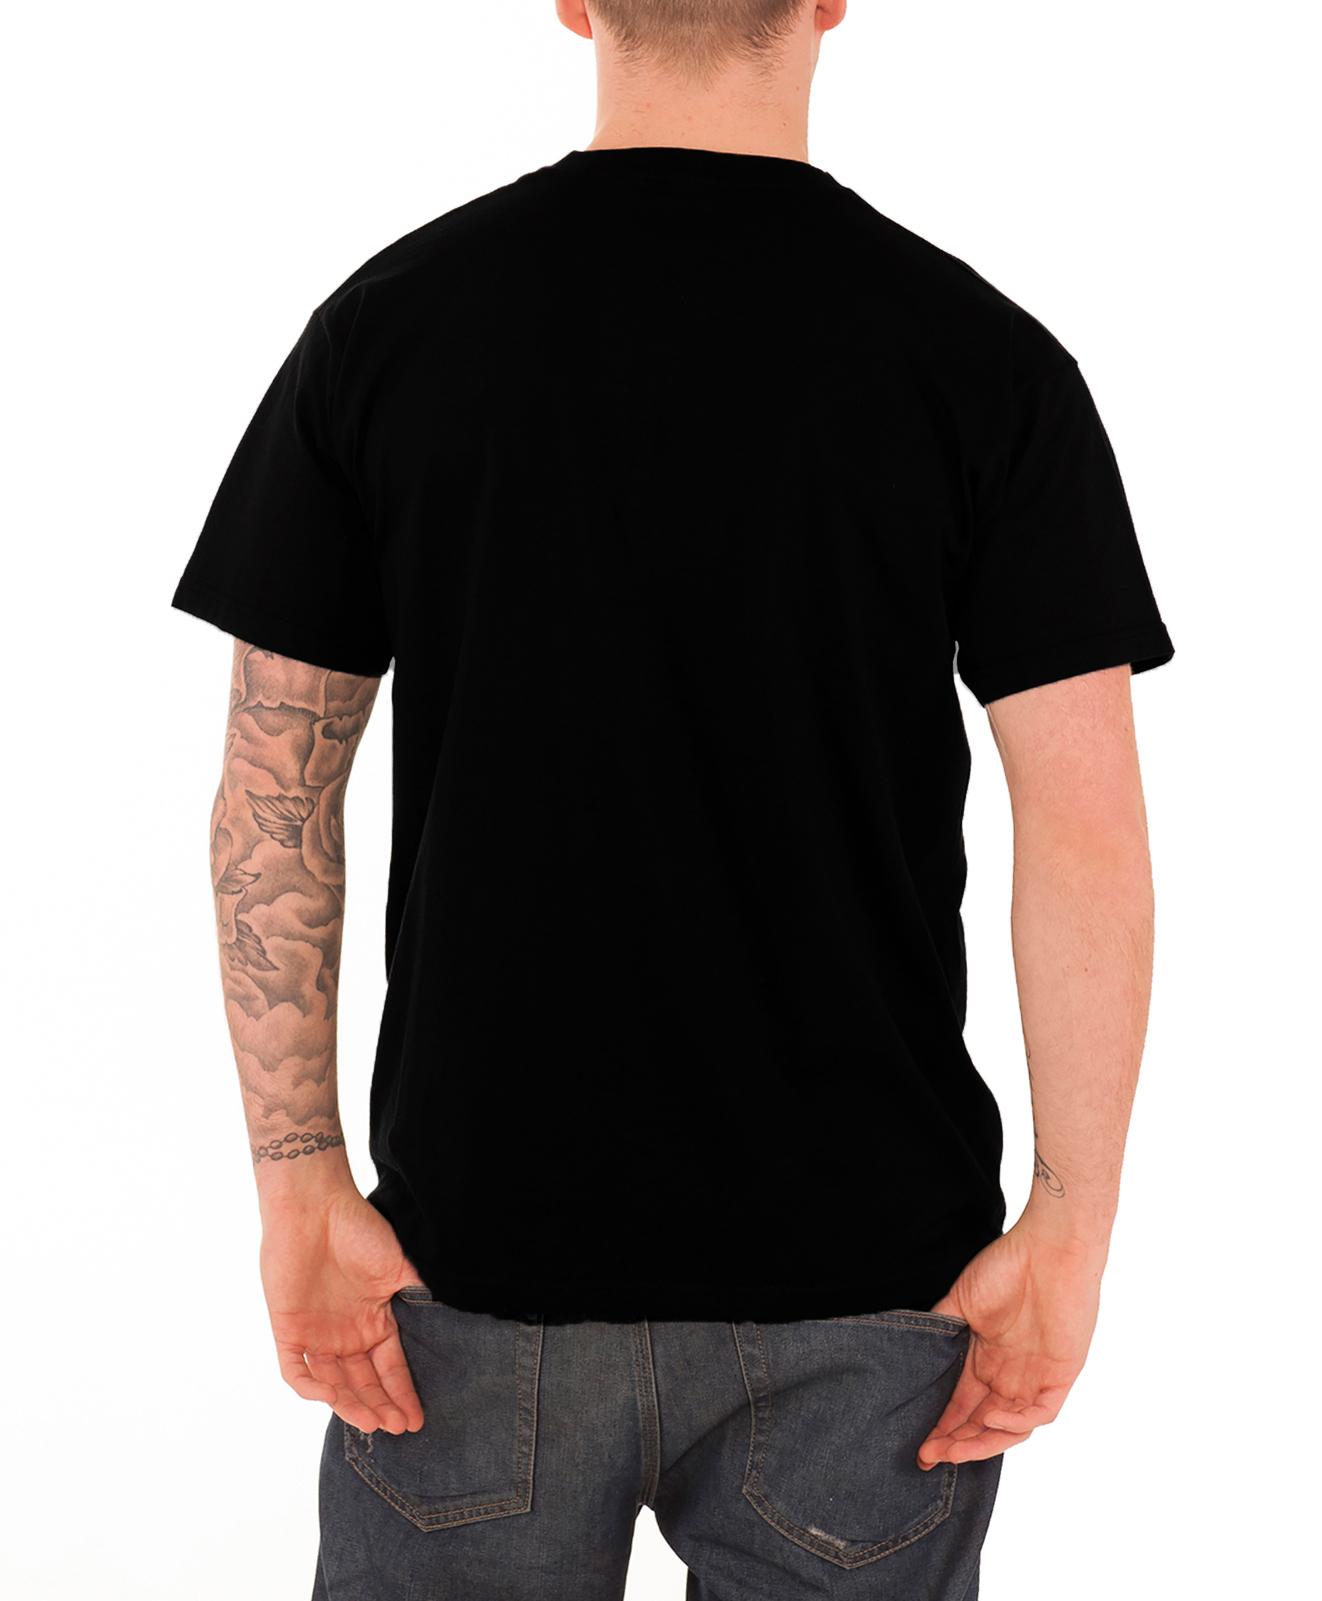 Official-Gas-Monkey-Garage-T-Shirt-Official-GMG-Logo-Kustom-Builds-new-Mens Indexbild 57